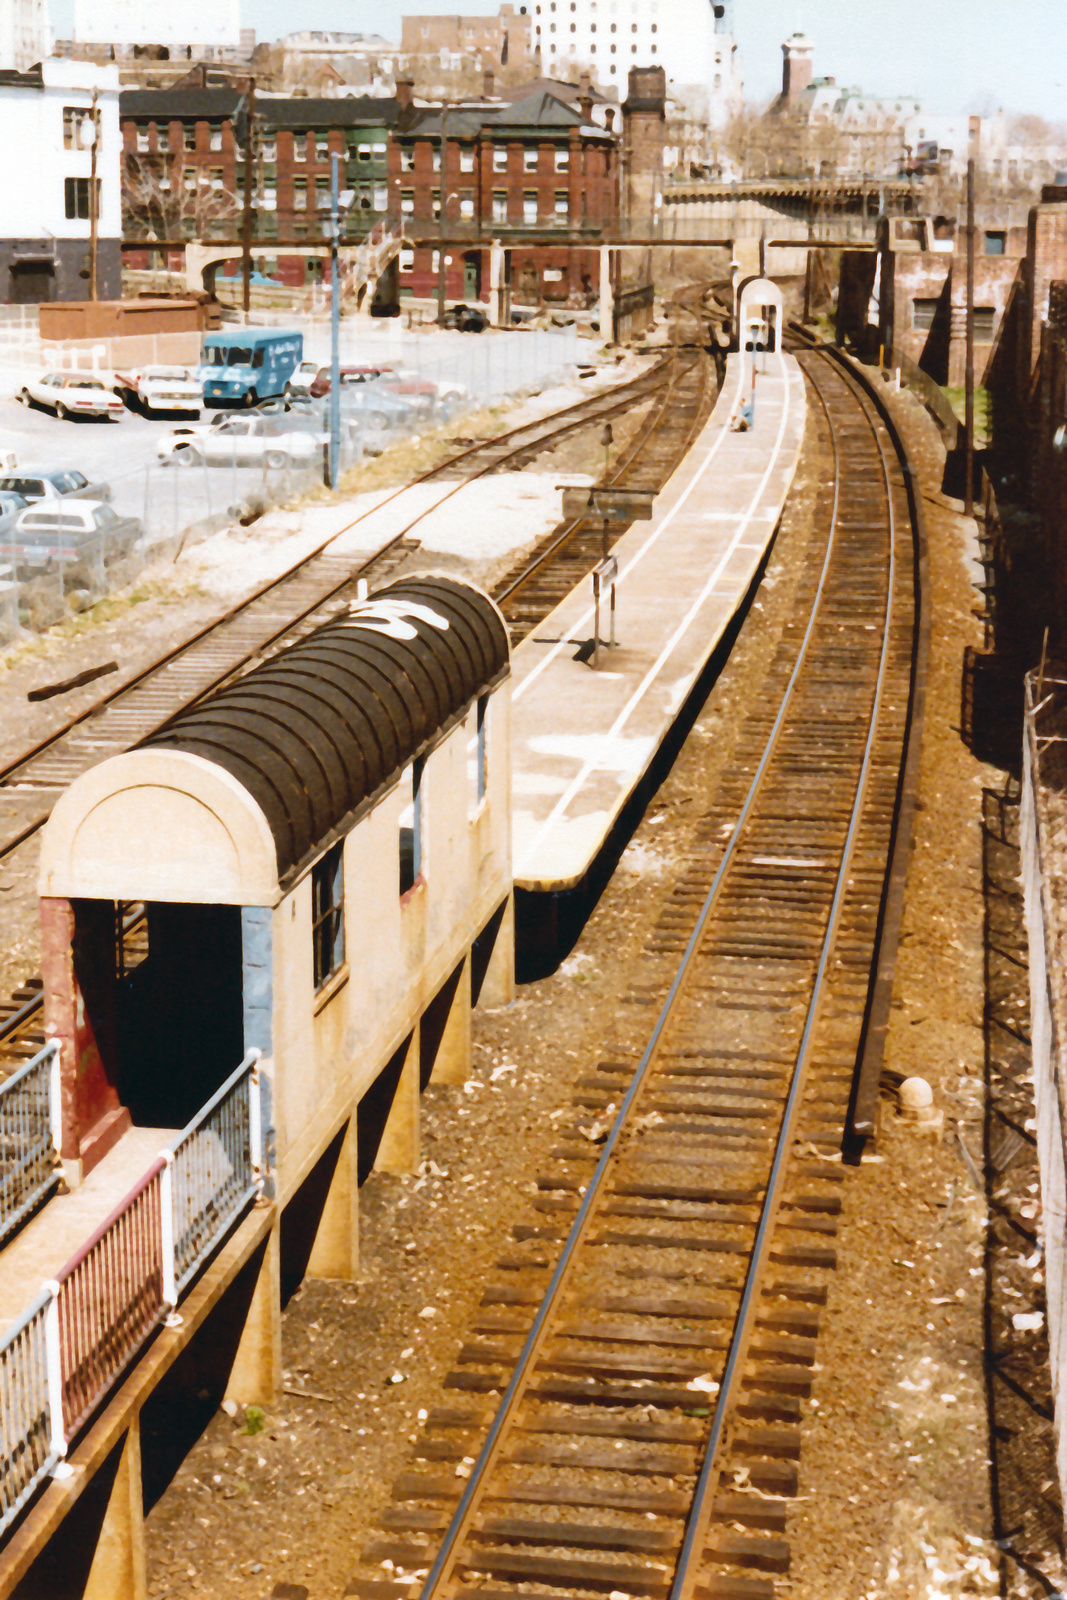 (946k, 1067x1600)<br><b>Country:</b> United States<br><b>City:</b> New York<br><b>System:</b> New York City Transit<br><b>Line:</b> SIRT<br><b>Location:</b> Tompkinsville <br><b>Collection of:</b> Nicholas Fabrizio<br><b>Viewed (this week/total):</b> 3 / 263